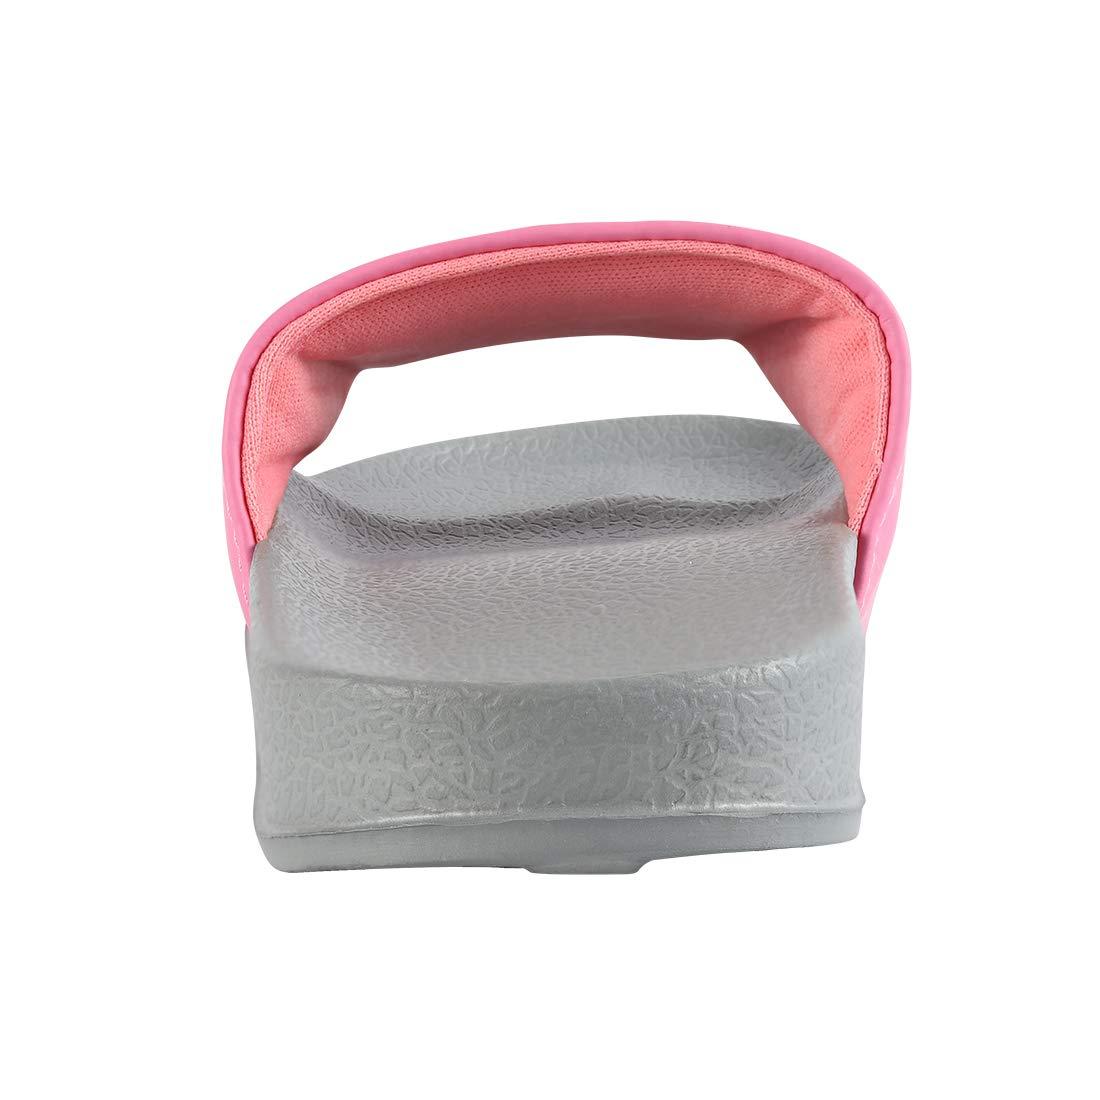 ZooYi Boys Girls Cartoon Bathroom Slide Slippers Kids Indoor Outdoor Soft Sandals Water Flip Flop Shoes (2 Little Kid, Pink)